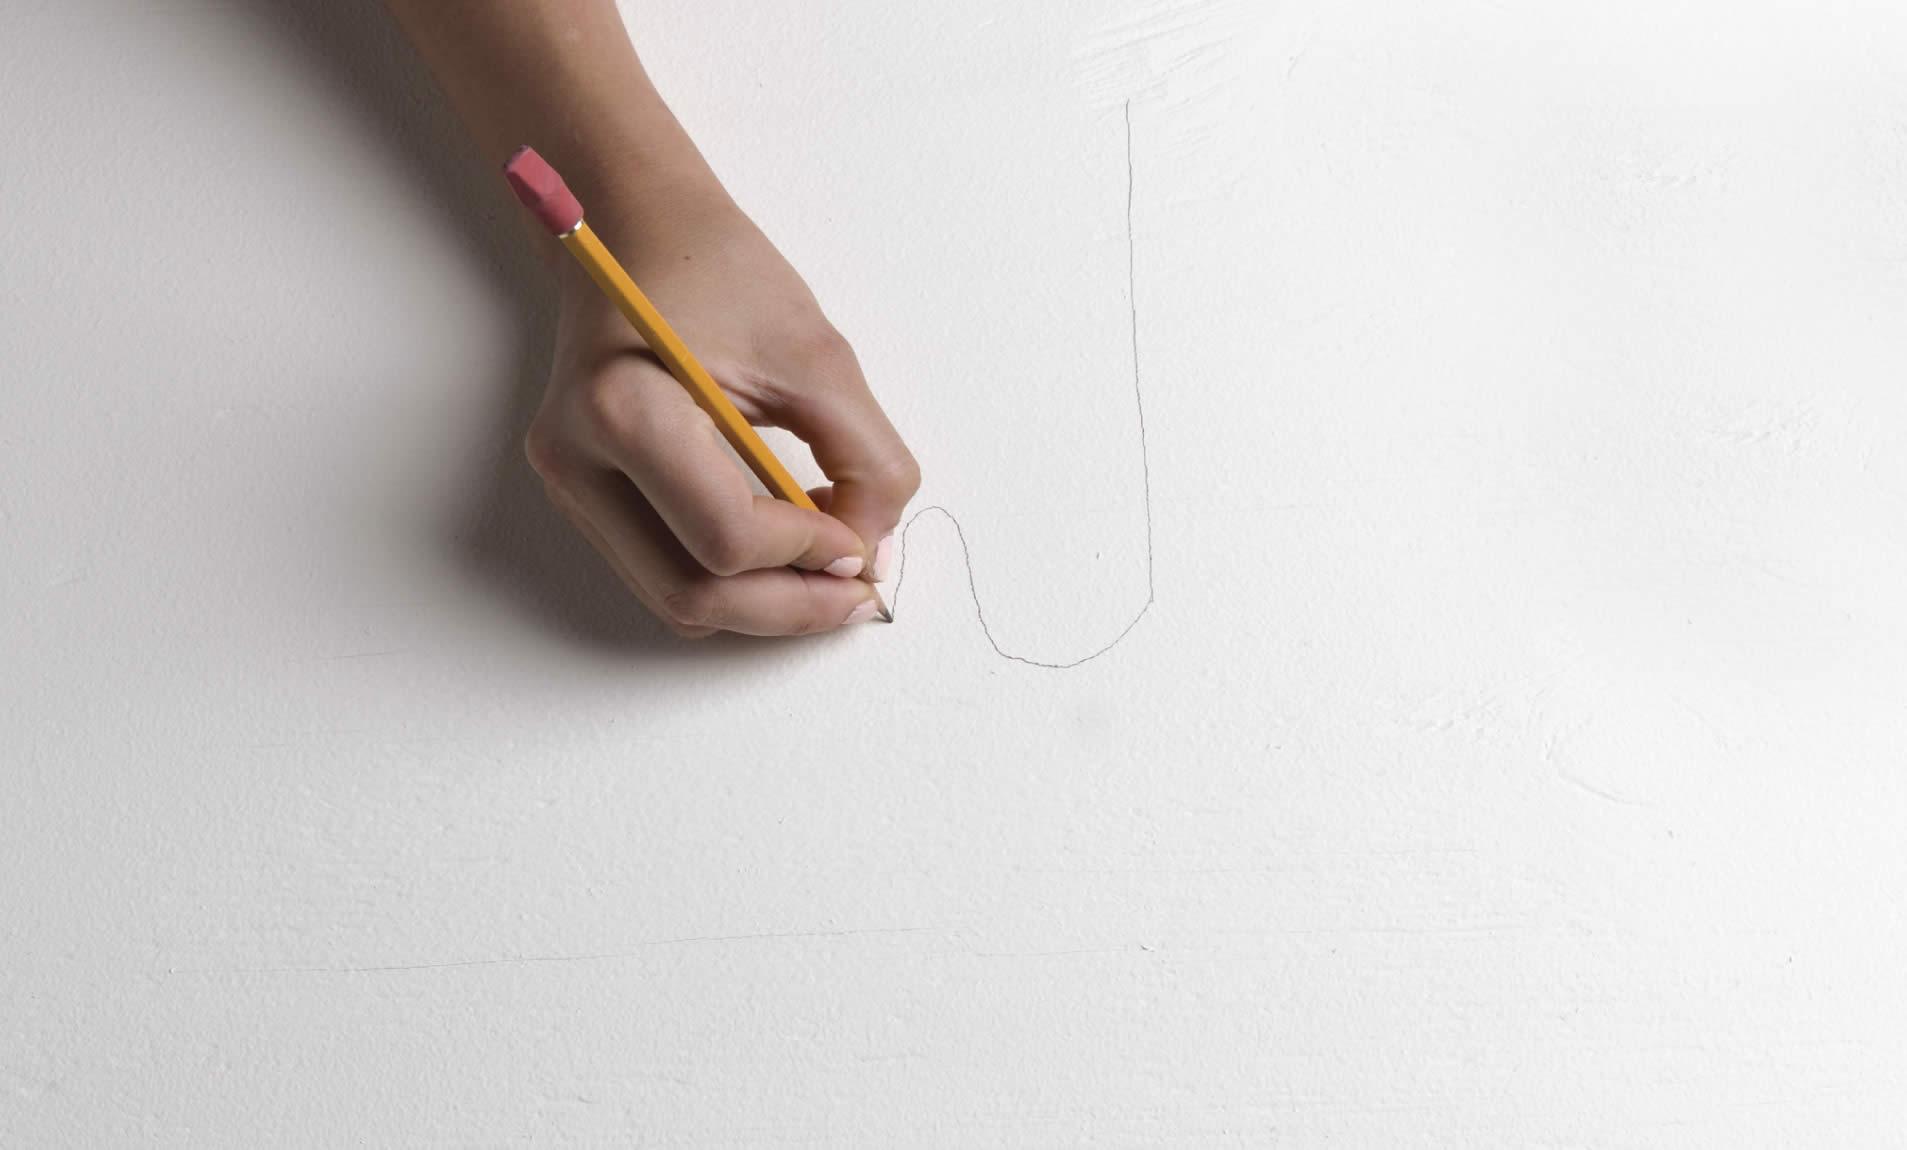 cable-mural-arrow-project-step6b.jpg